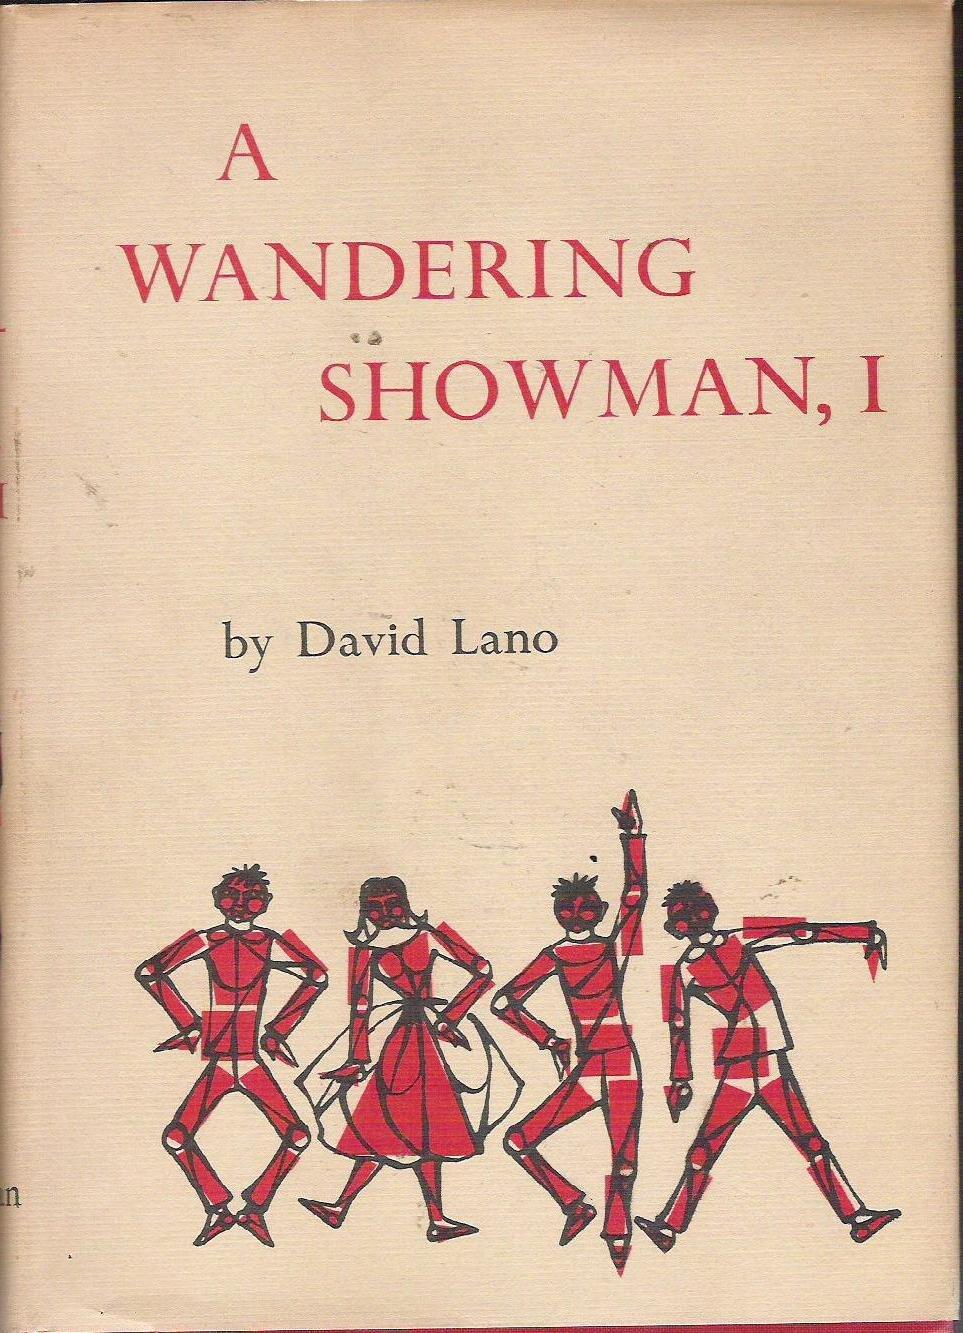 A wandering showman, I